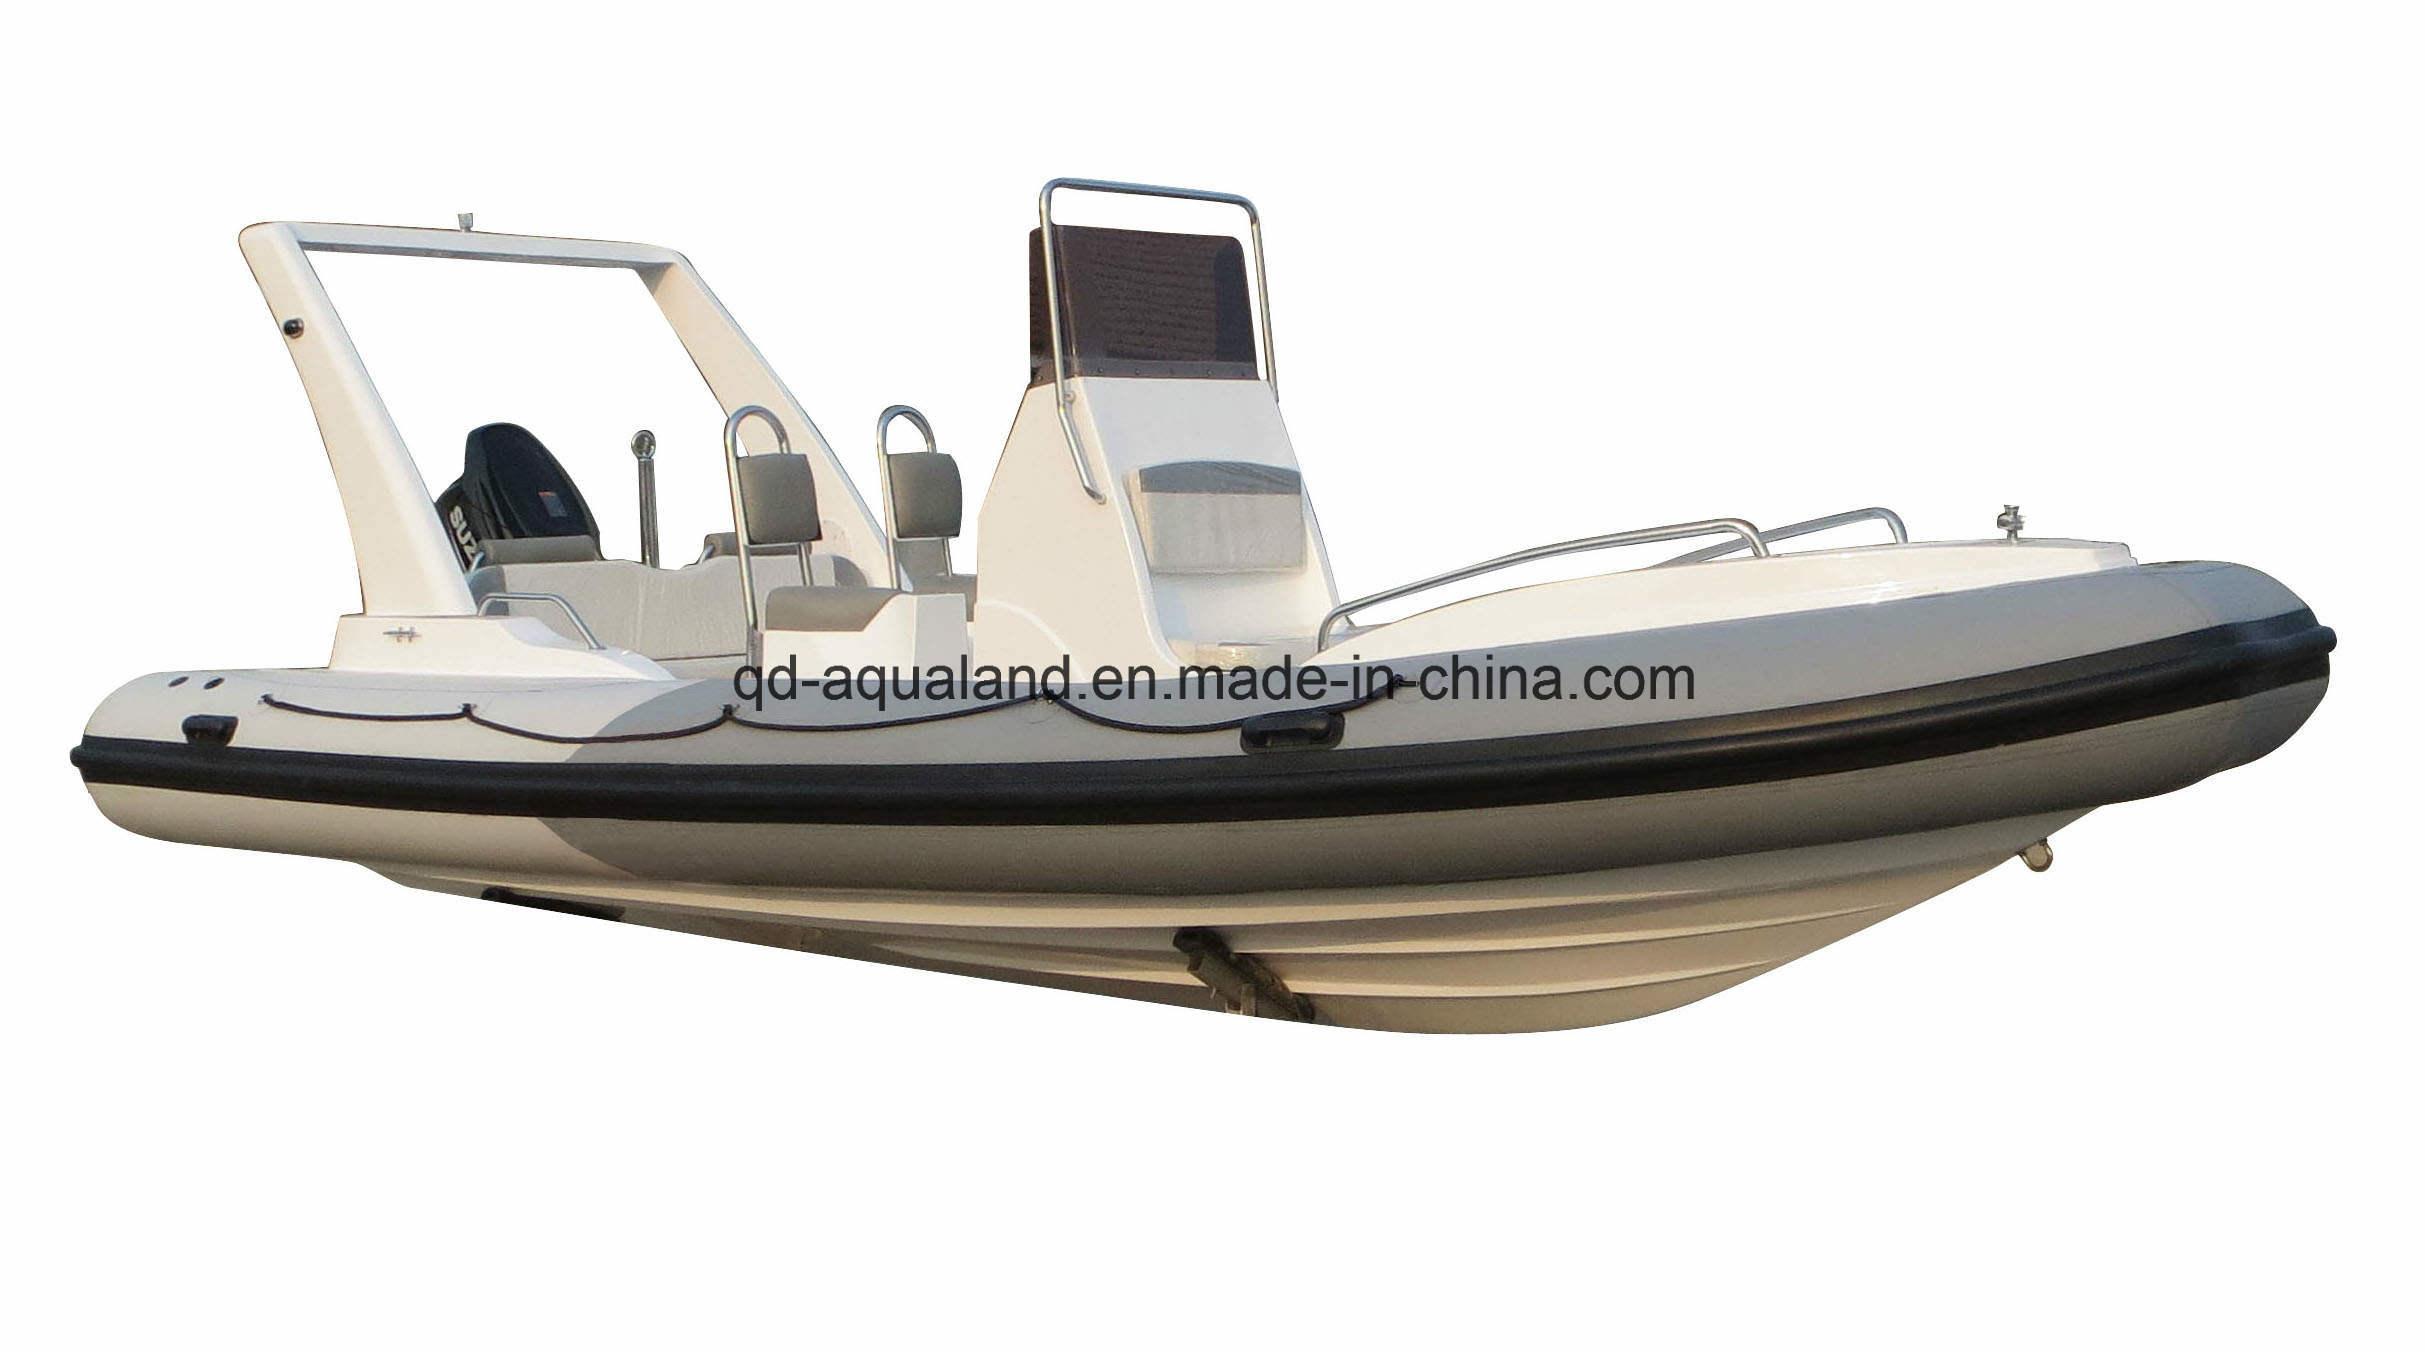 bateau 6 5 m